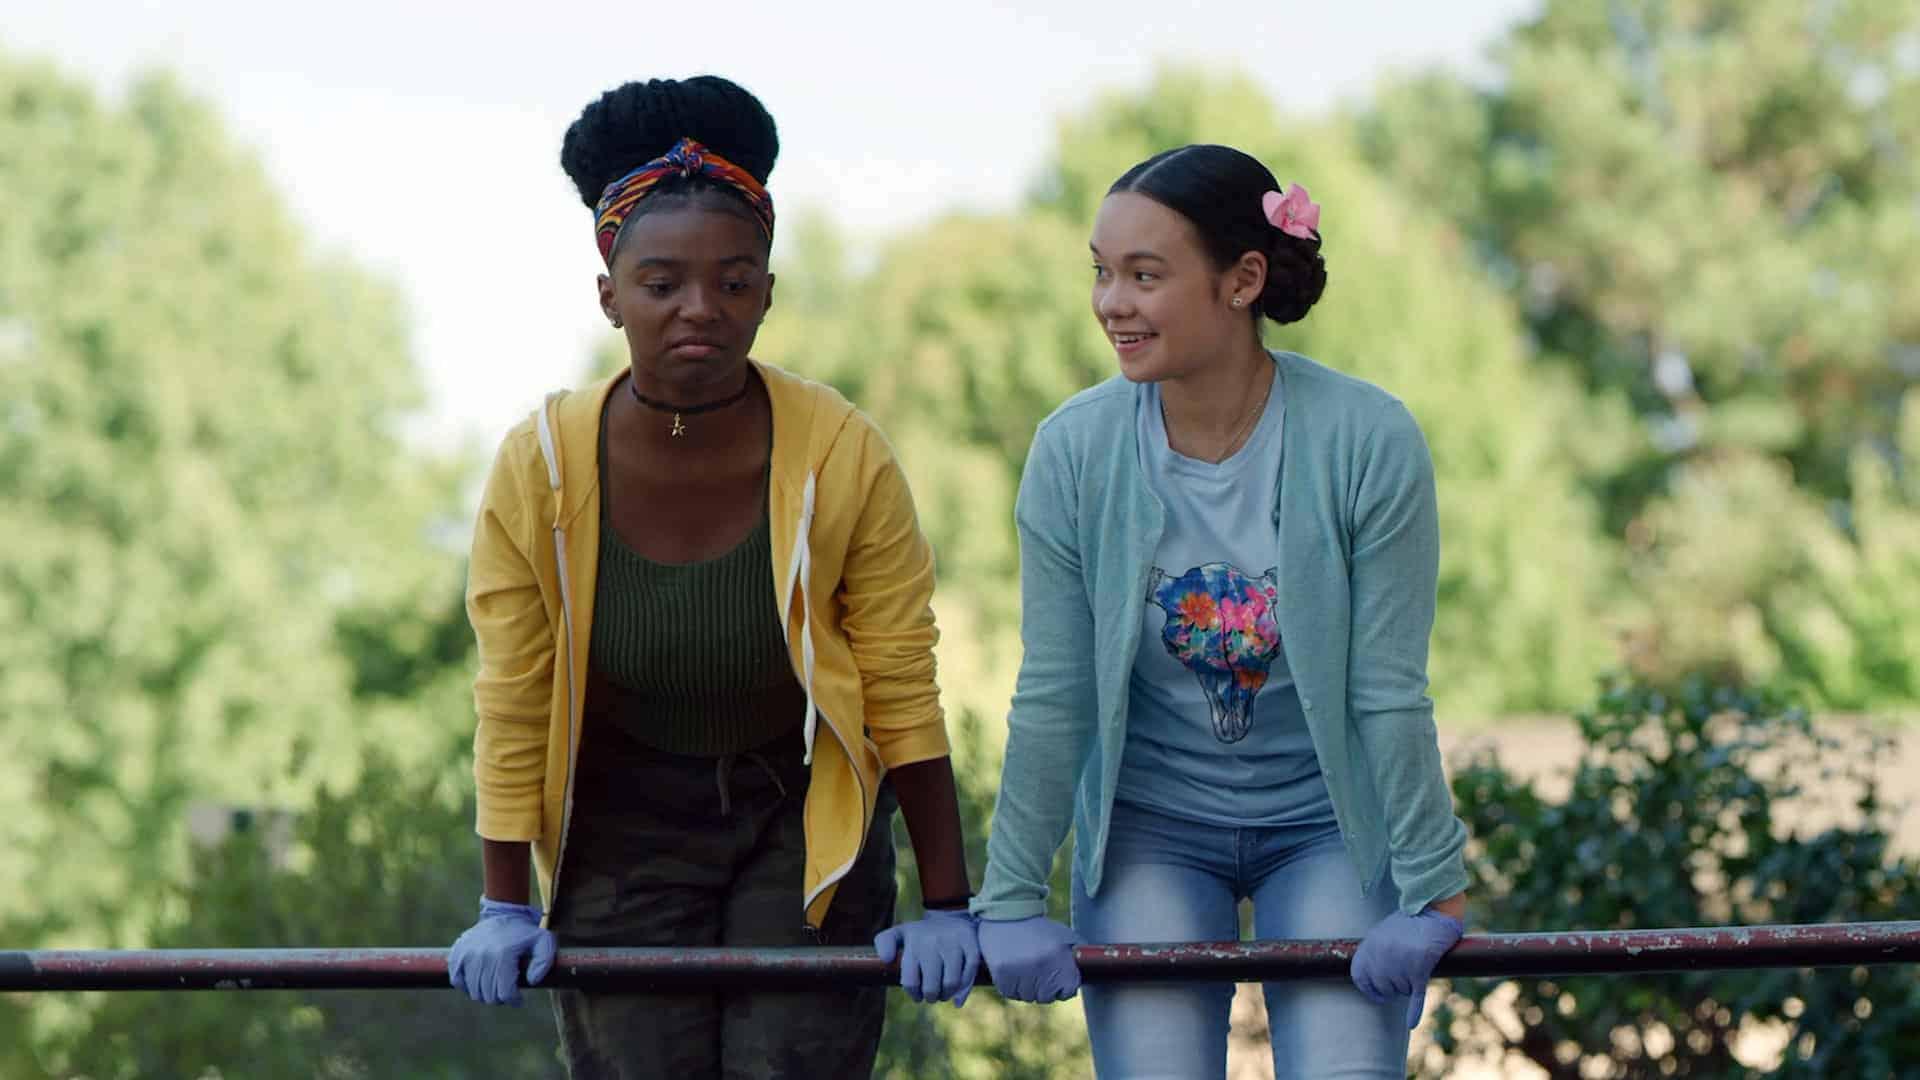 Lulu (Ja'ness Tate) and Gabby (Gabriella Pastore) about to jump into a dumpster.